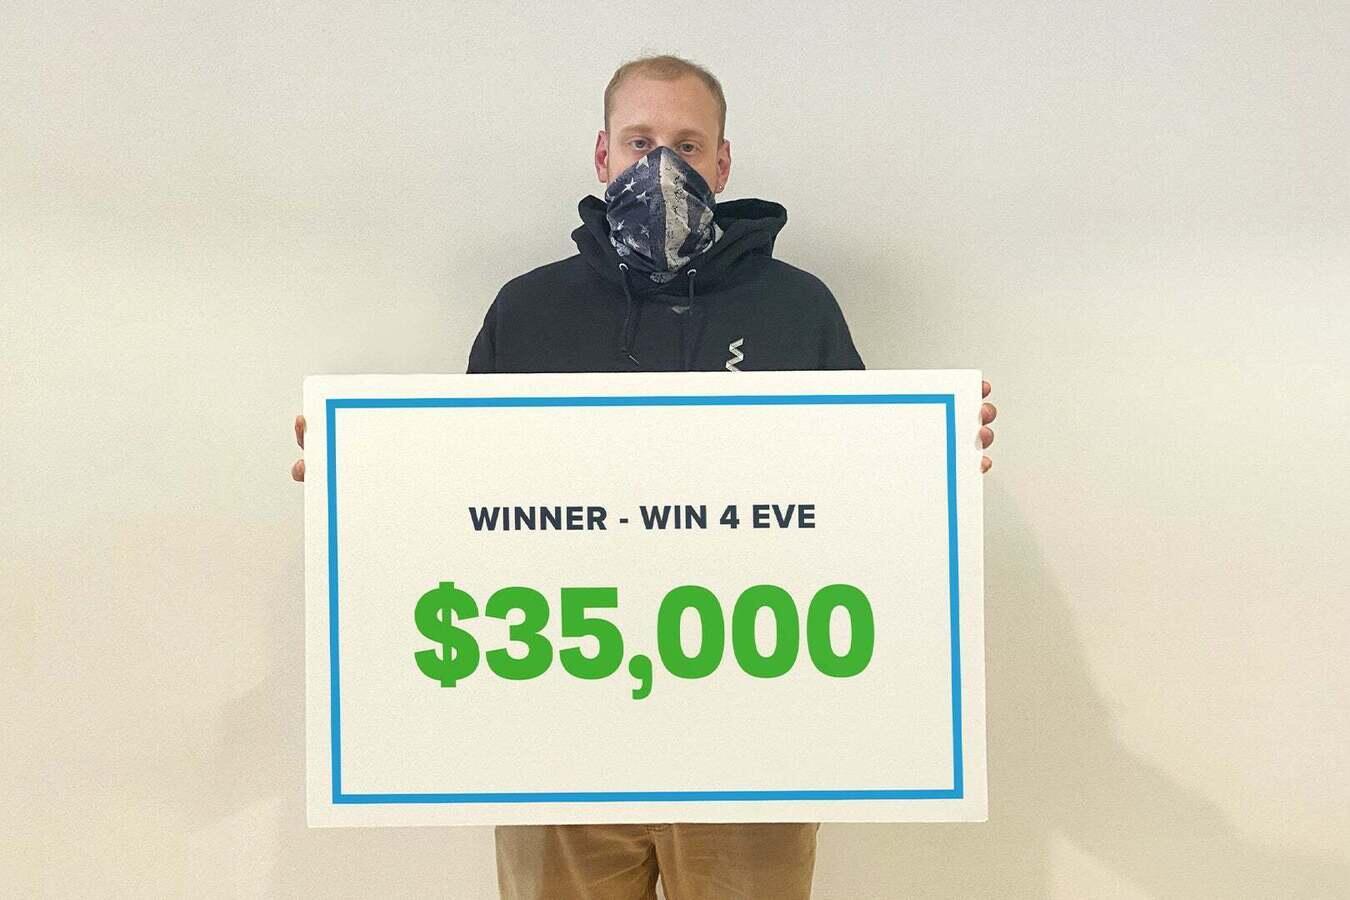 John won $35,000 playing Win4 on Jackpocket